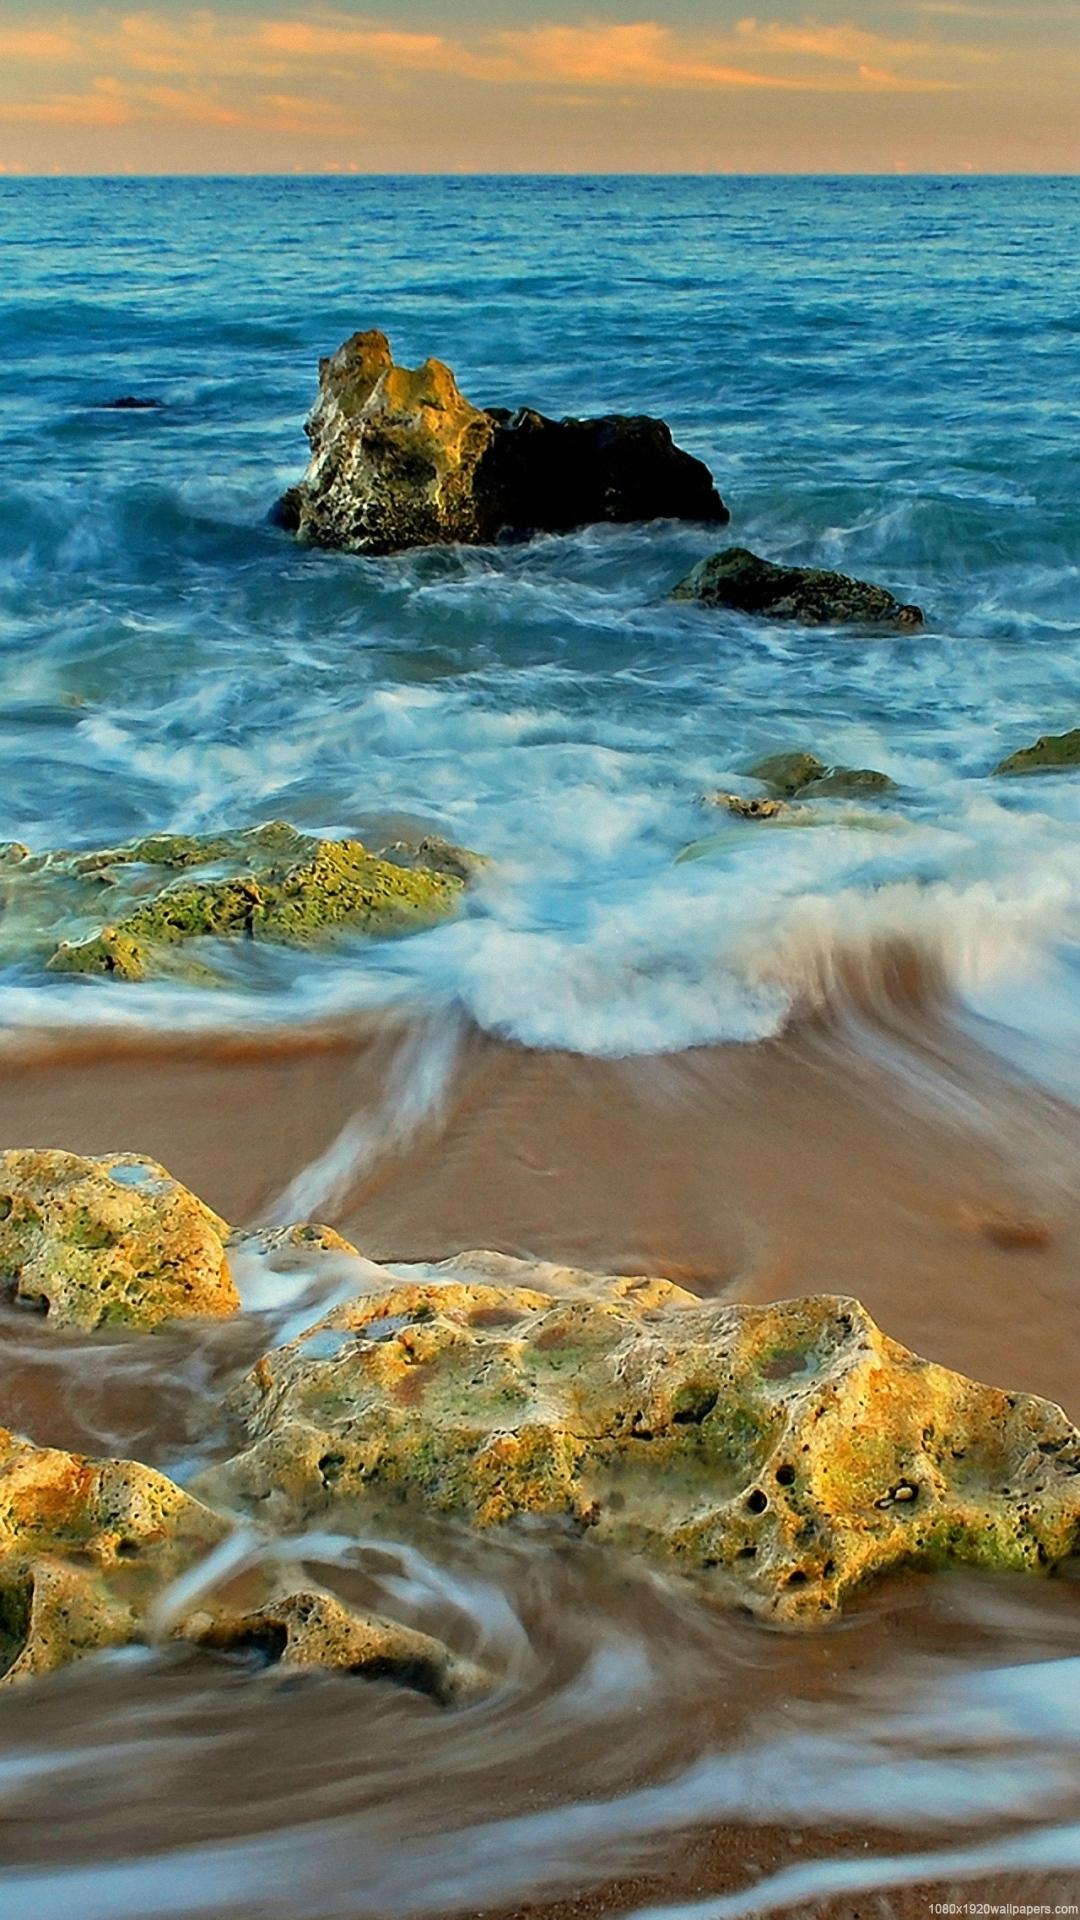 1080p tropical landscape wallpapers wallpapersafari - Beach hd wallpapers 1080p ...